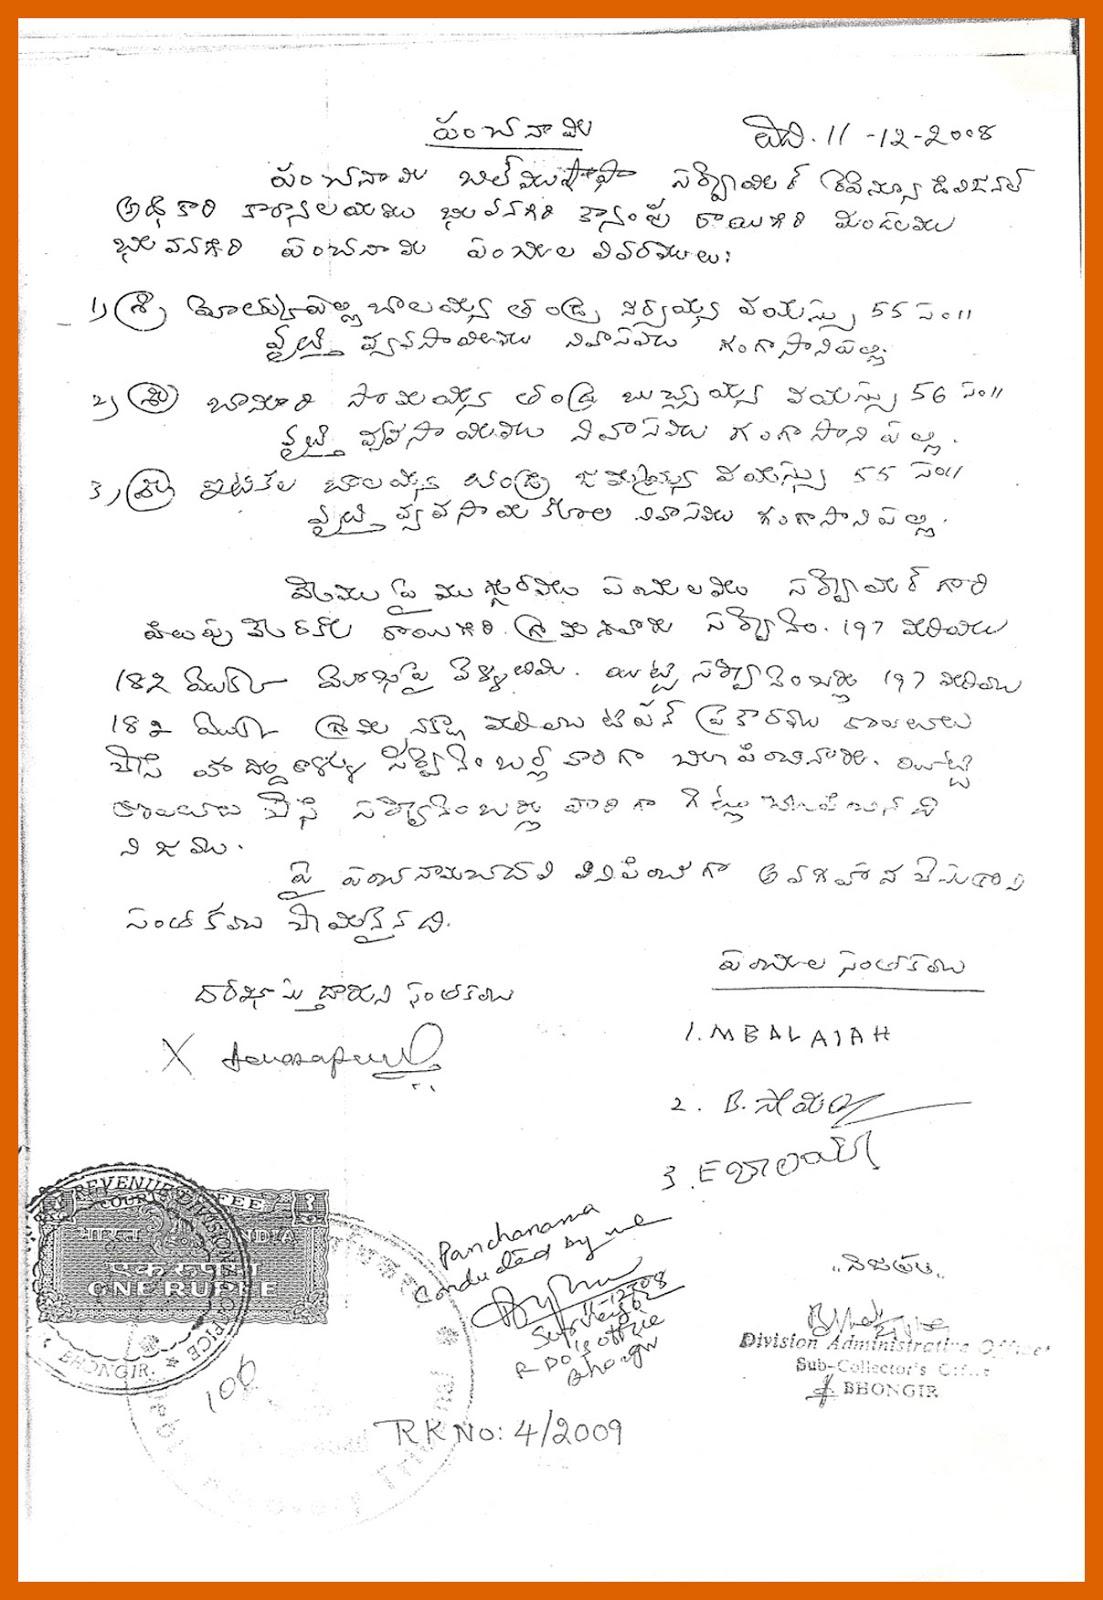 Survey No. 182 and 197 at Yadadri-Bhuvanagiri district-1